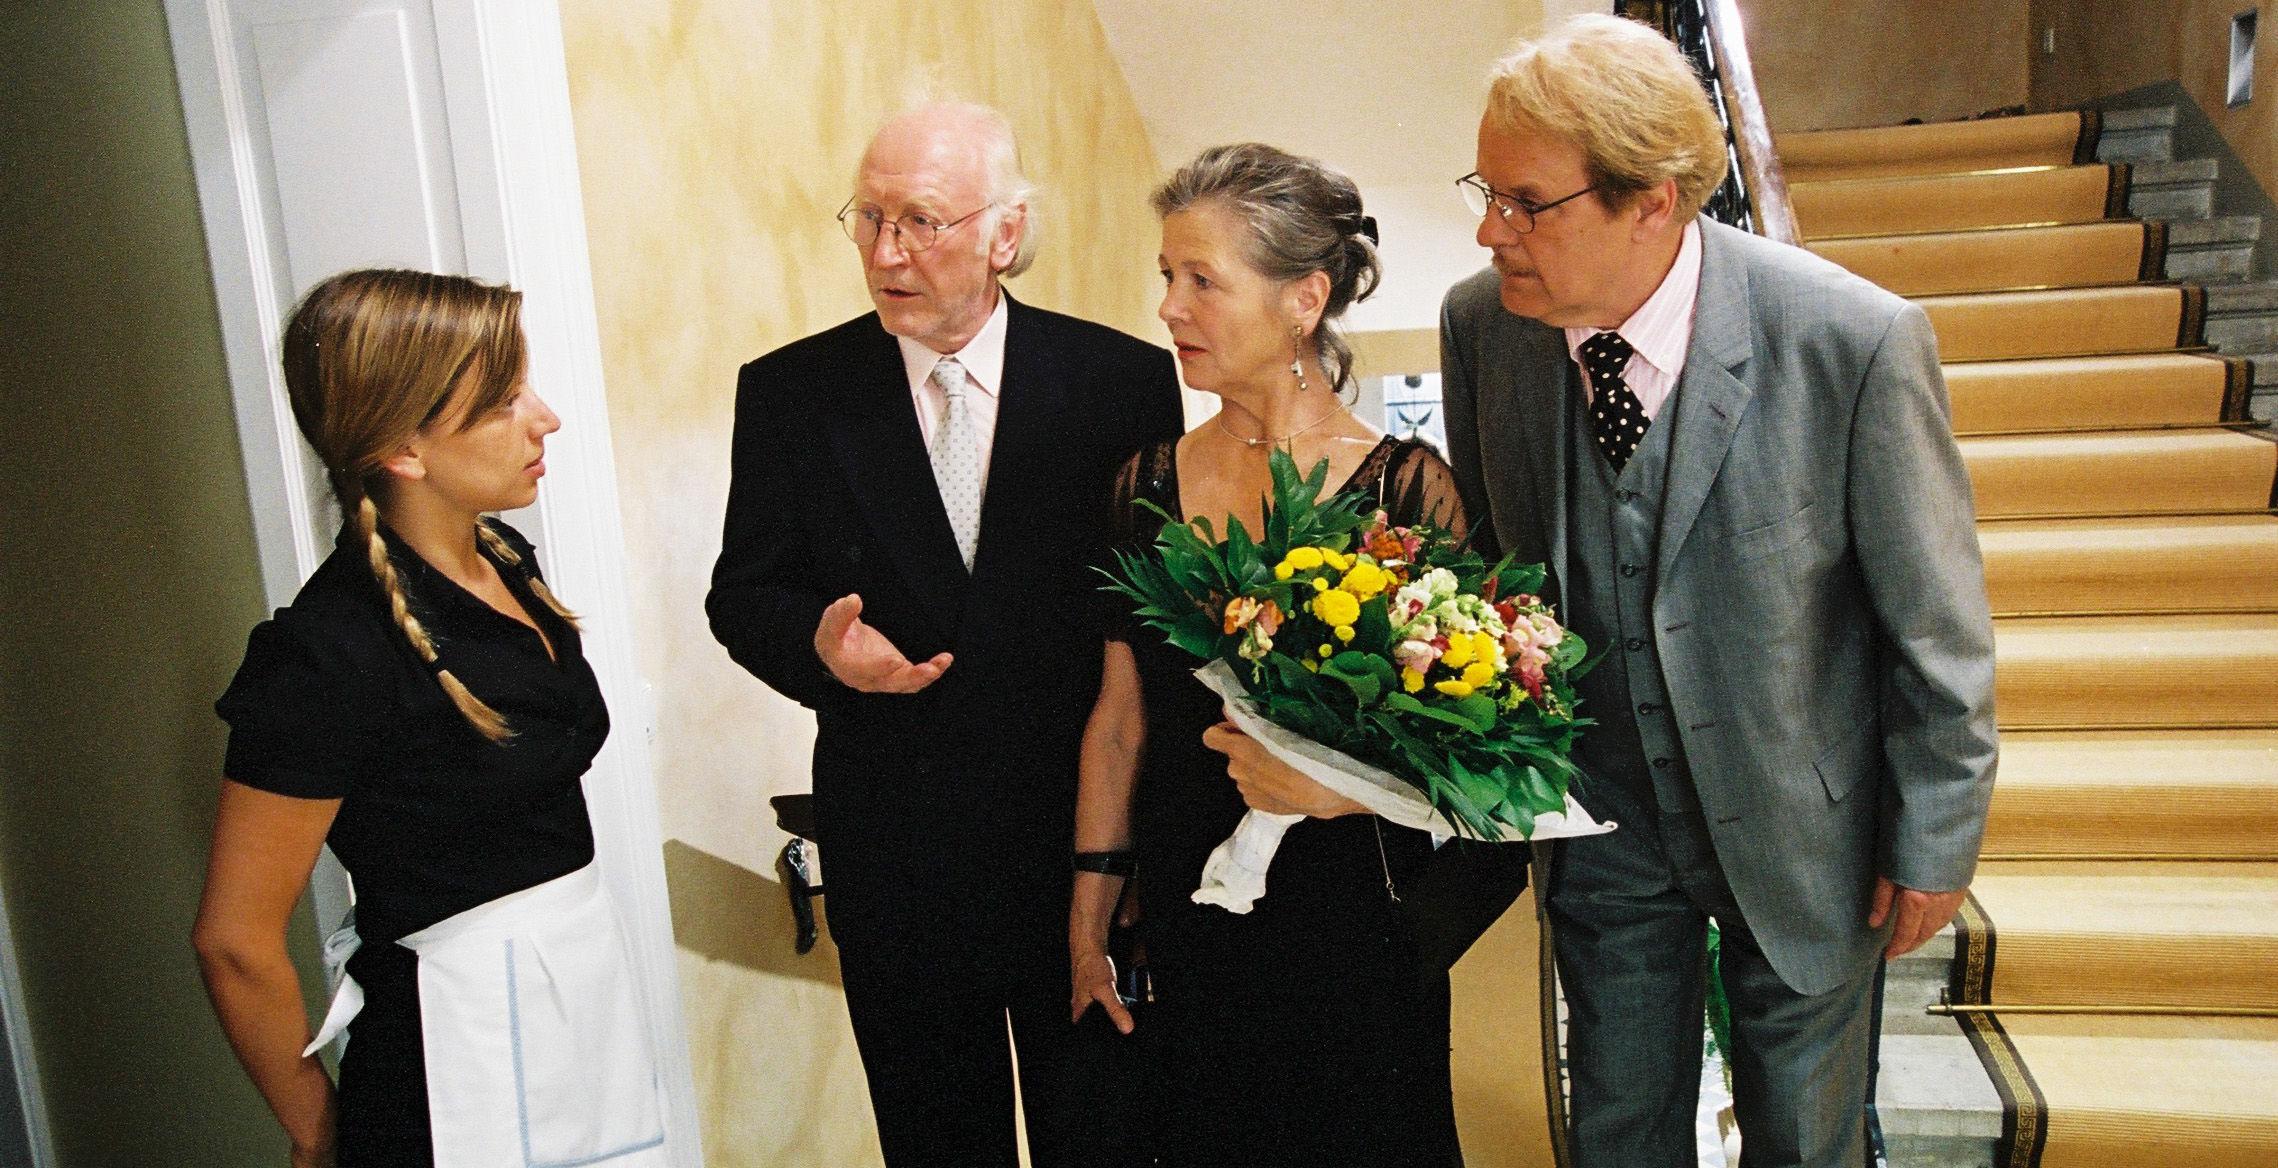 Haushaltshilfe (Martina Schwab), Paul (Karl Merkatz), Sandra (Helma Gautier), Albert (Peter Fricke)